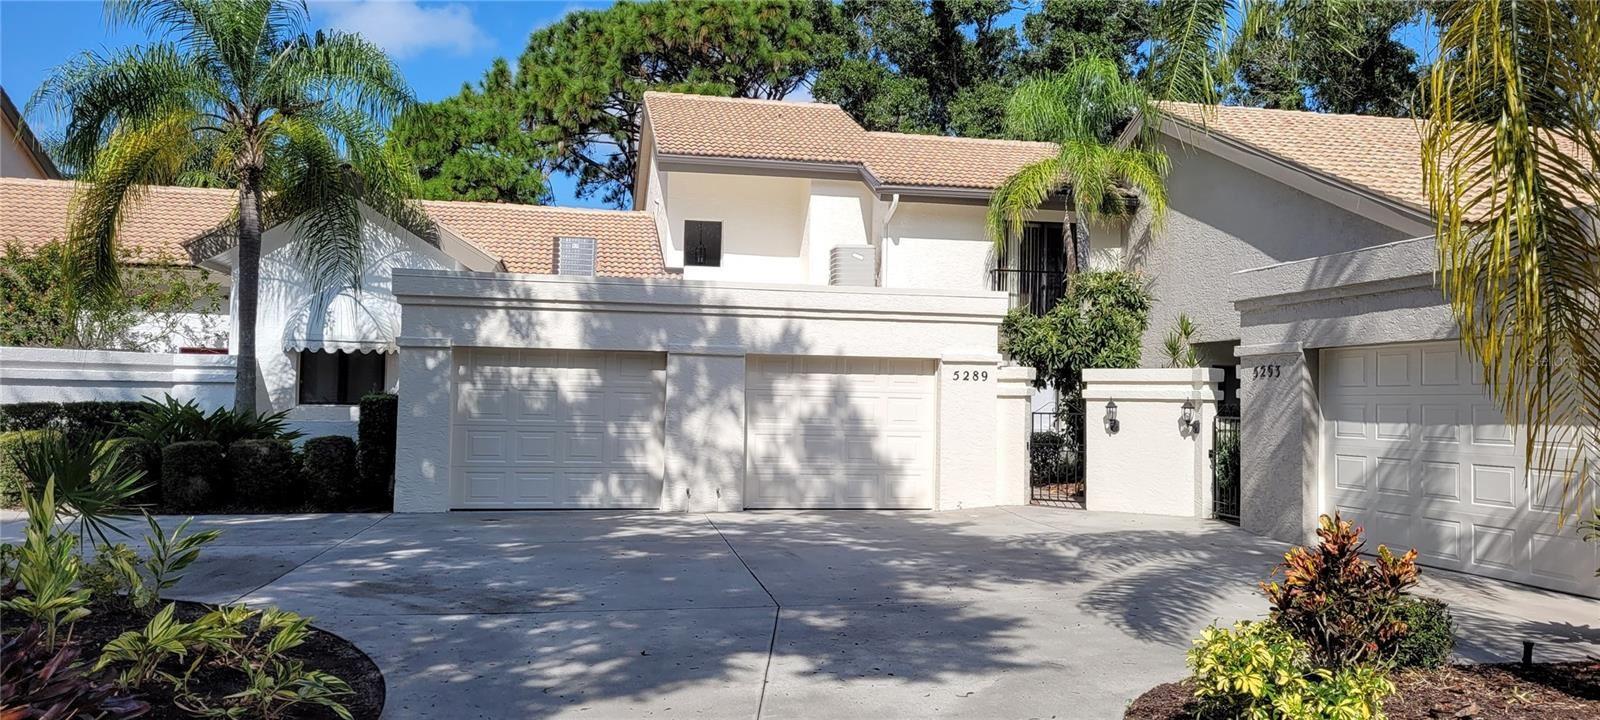 5289 TIVOLI AVENUE, Sarasota, FL 34235 - #: A4515371